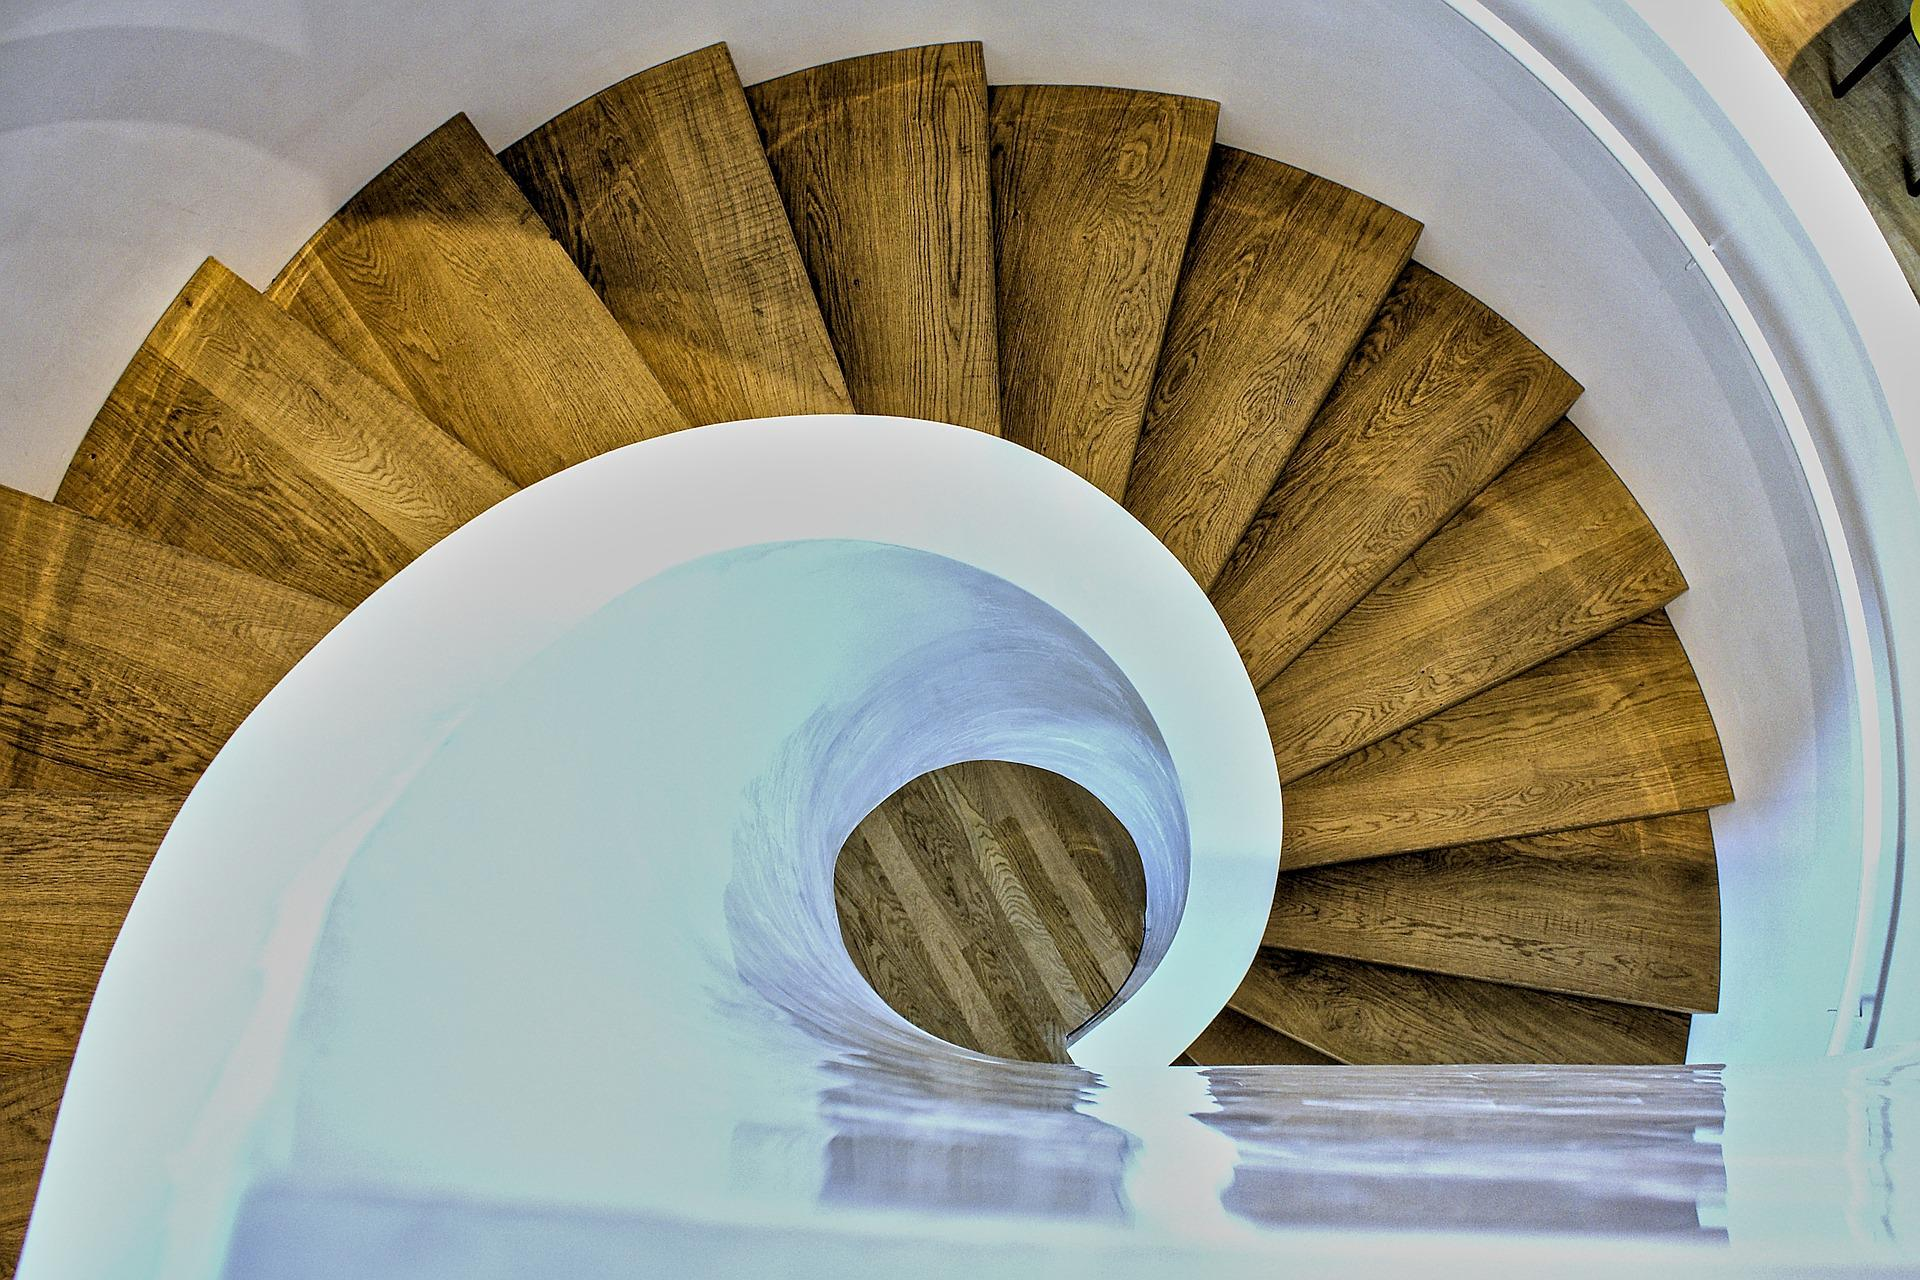 schody jak ślimak